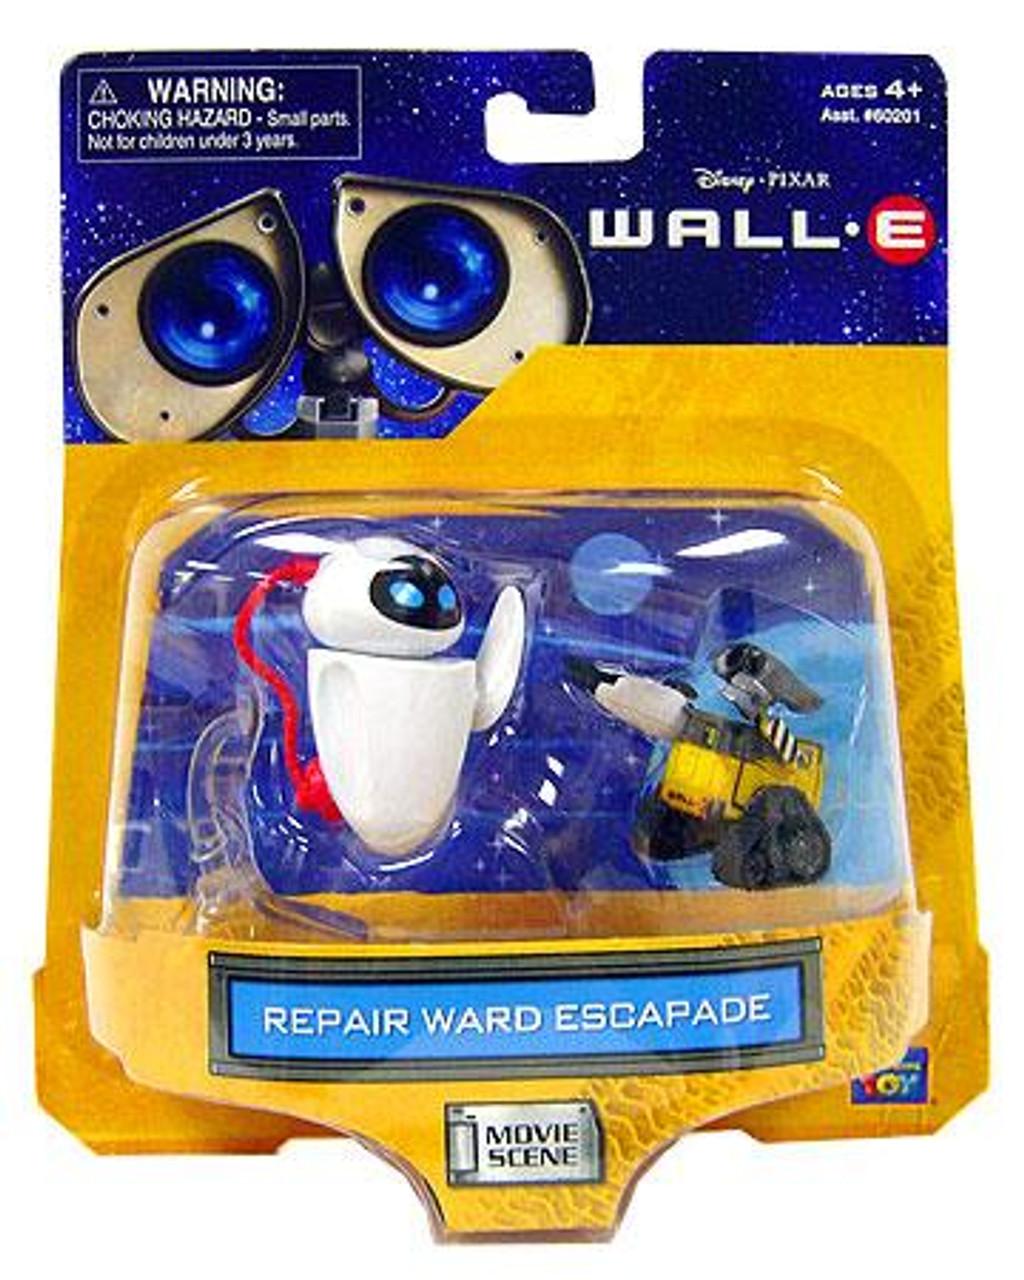 Disney / Pixar Wall-E Movie Scene Repair Ward Escapade Mini Figure 2-Pack